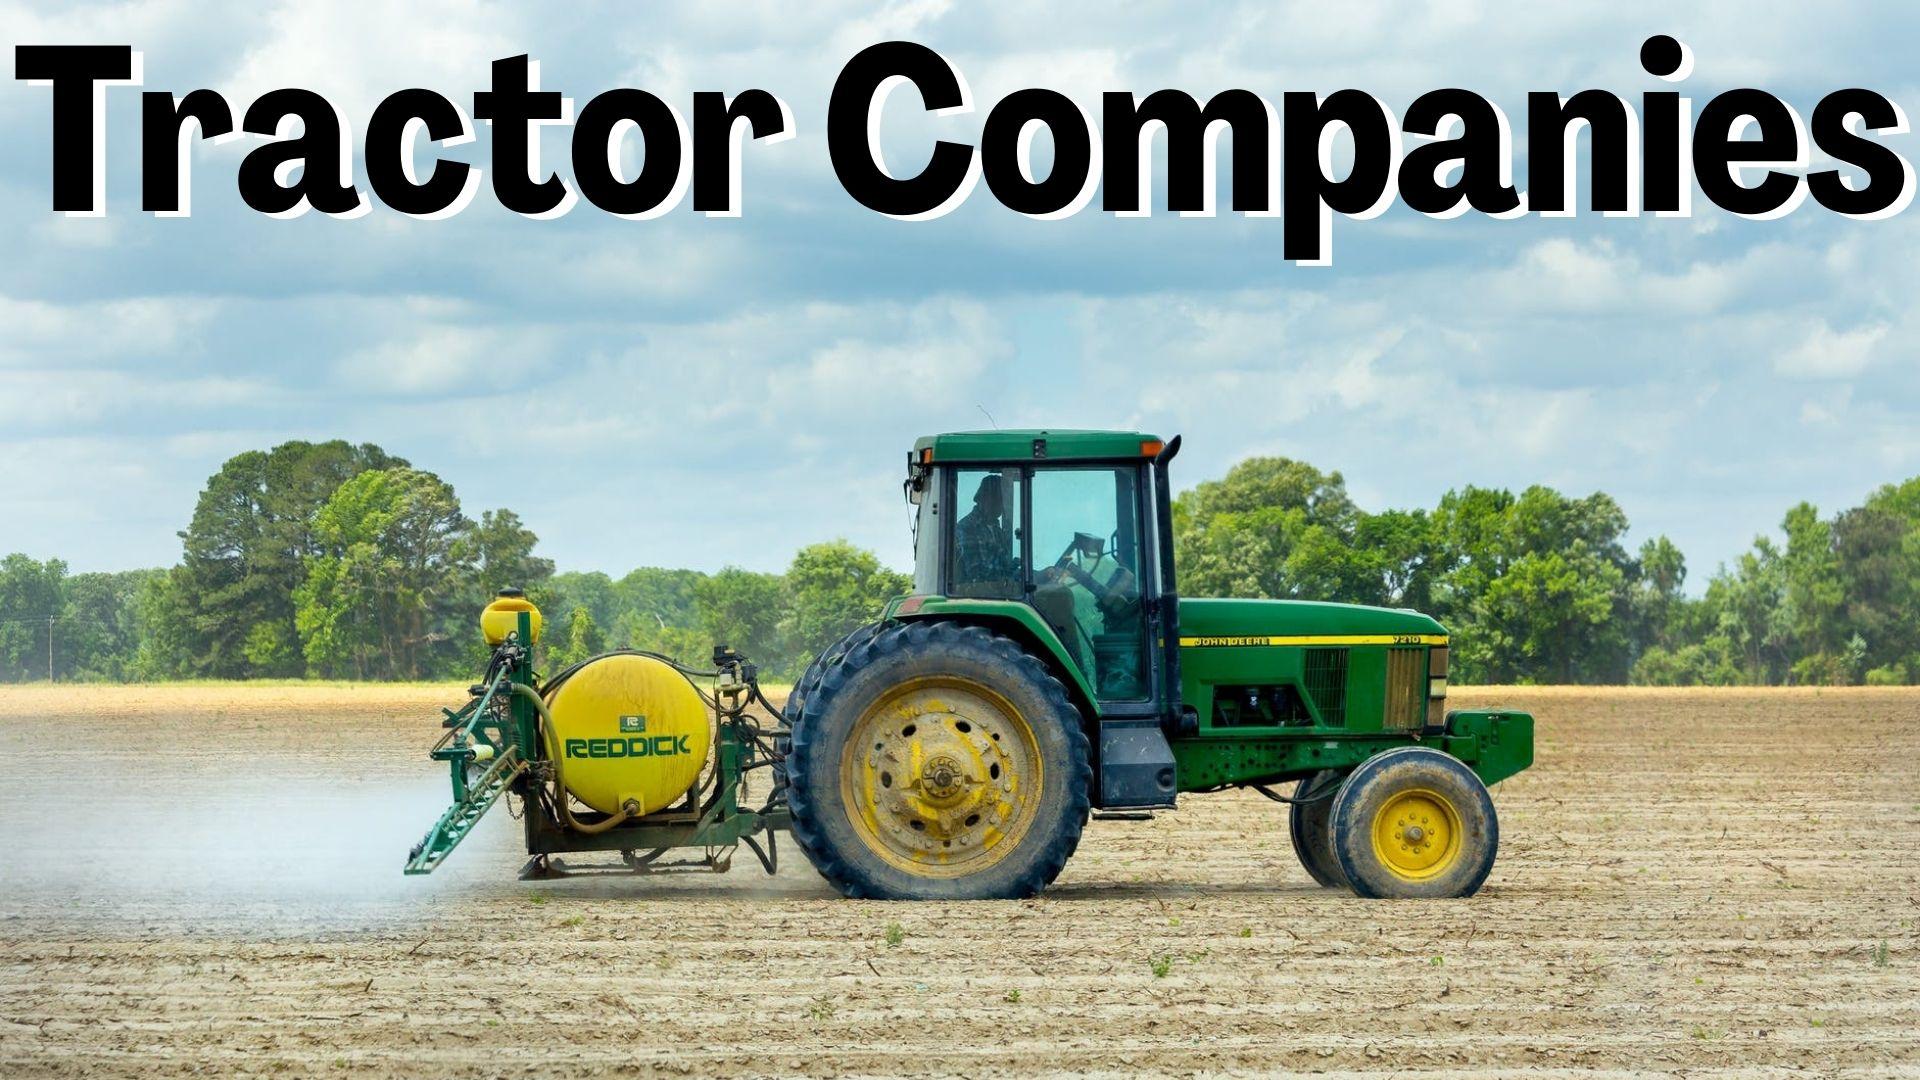 Tractor Companies